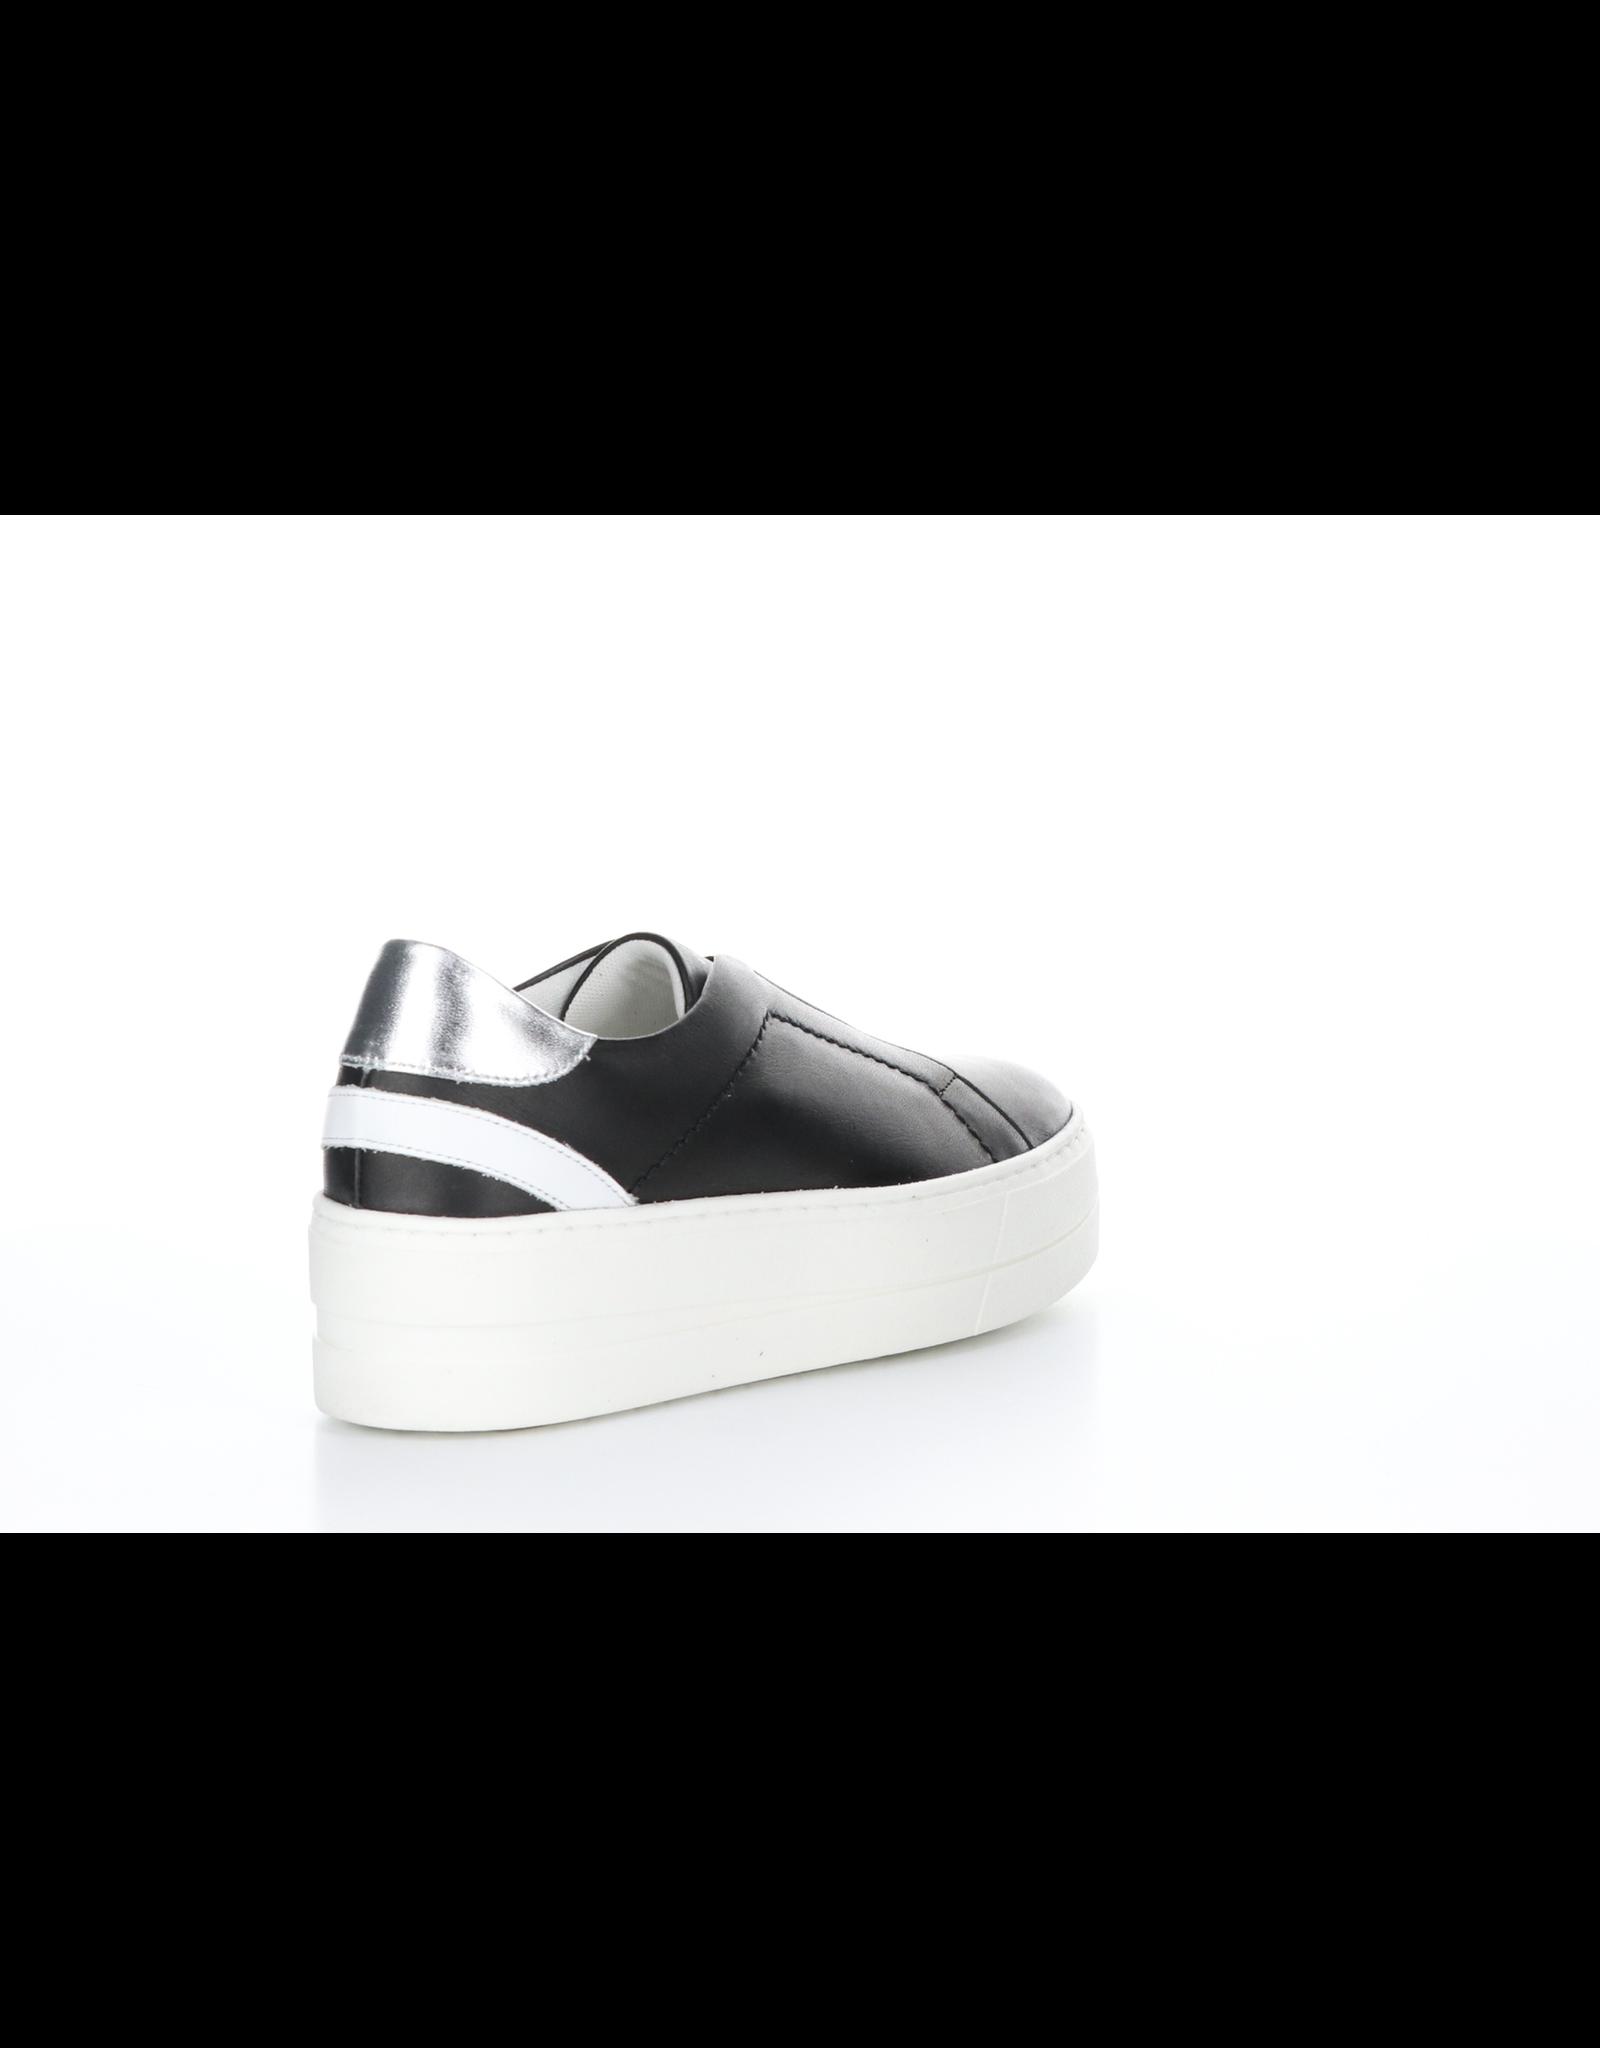 Bos & Co Bos & Co - Mona (blk/white/silver)